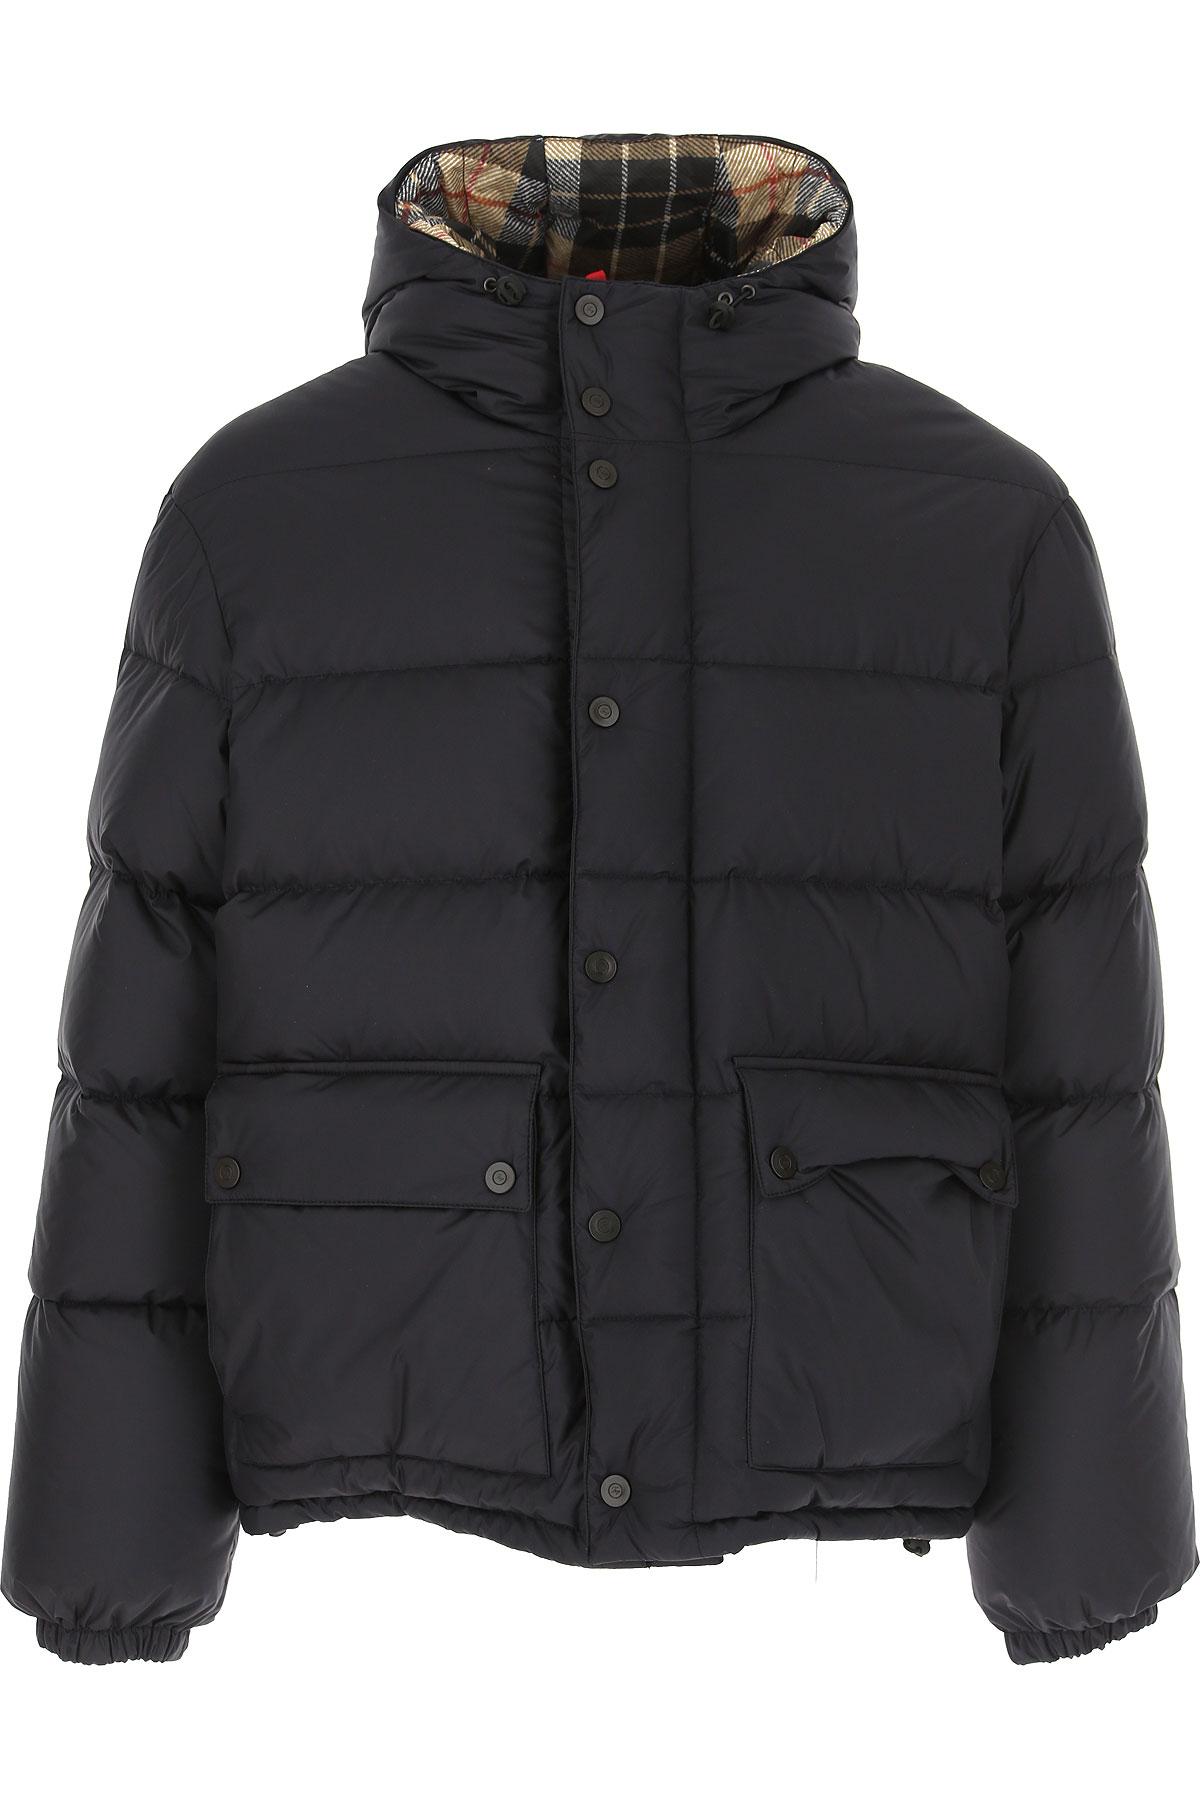 Fay Down Jacket for Men, Puffer Ski Jacket On Sale, Ink Blue, polyamide, 2019, L M XL